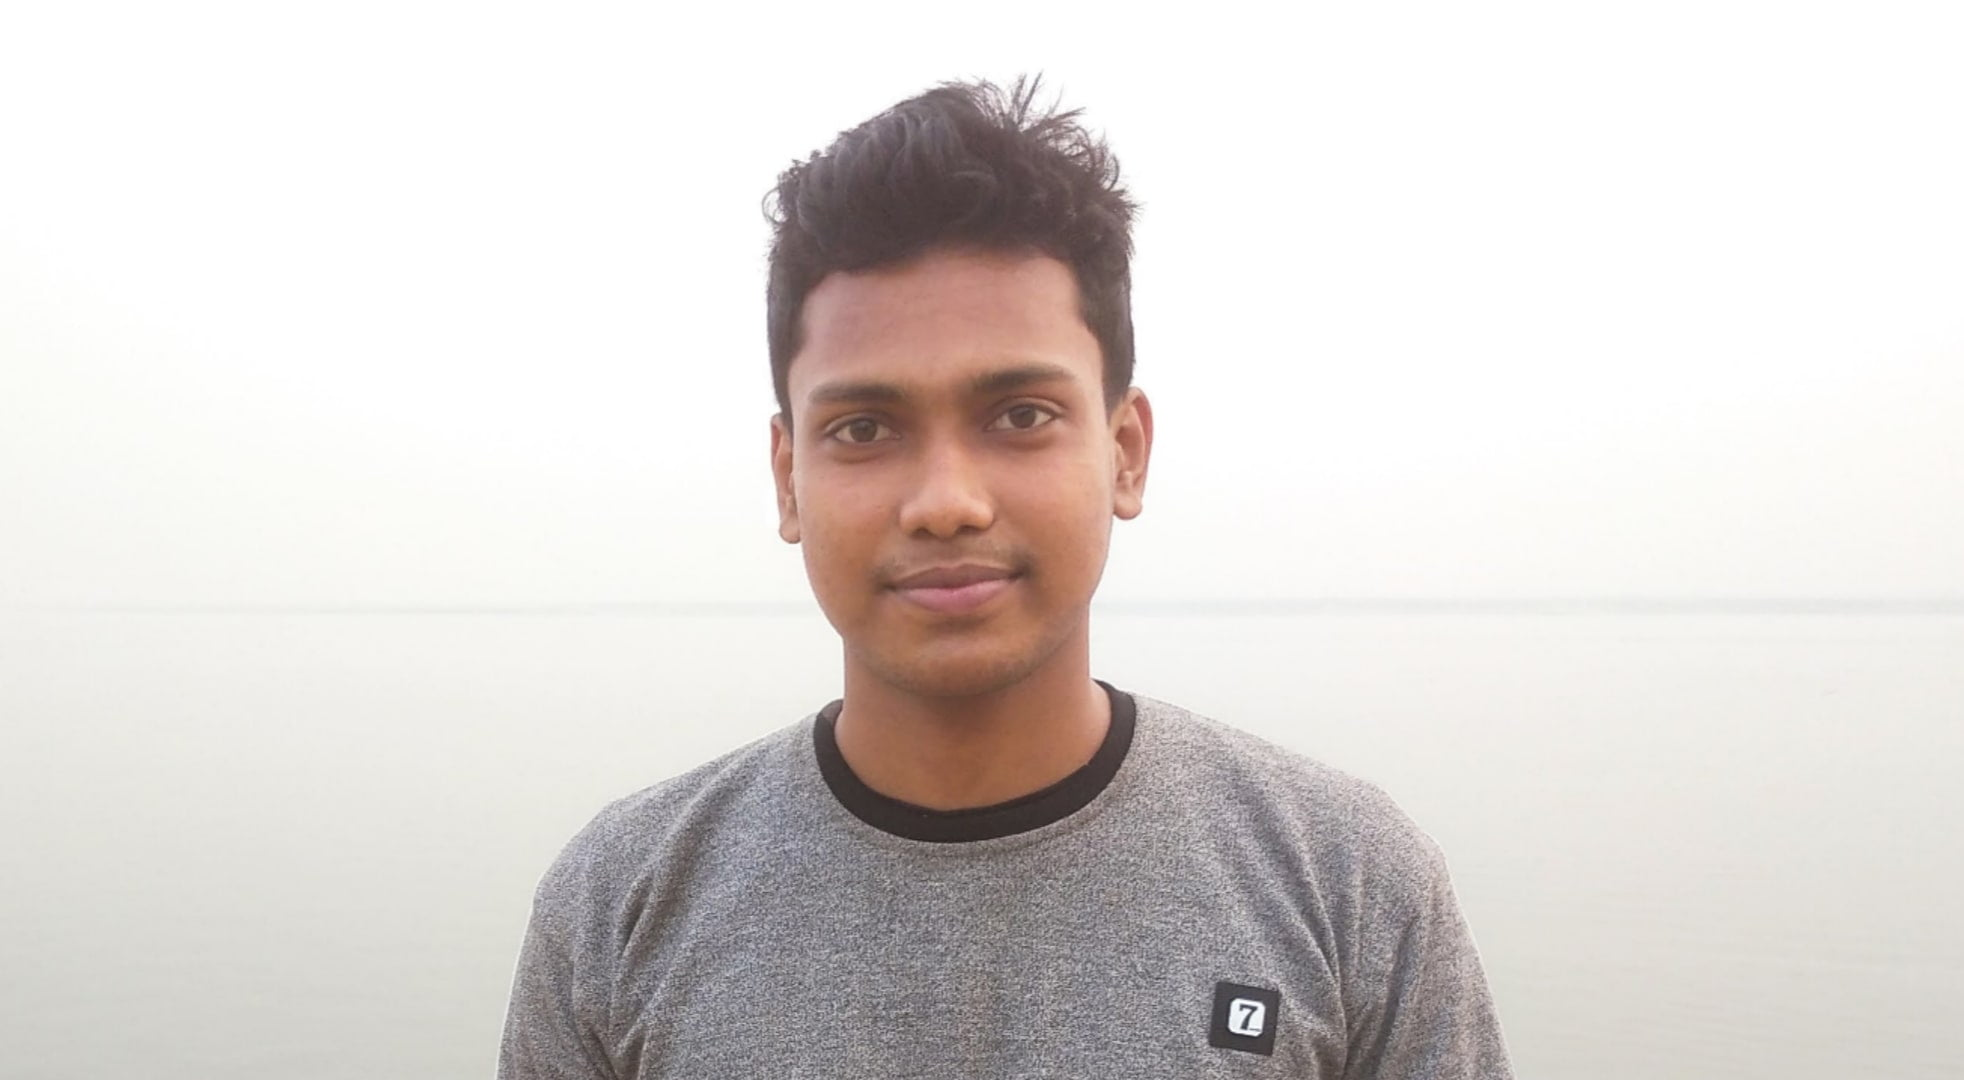 My Image 1